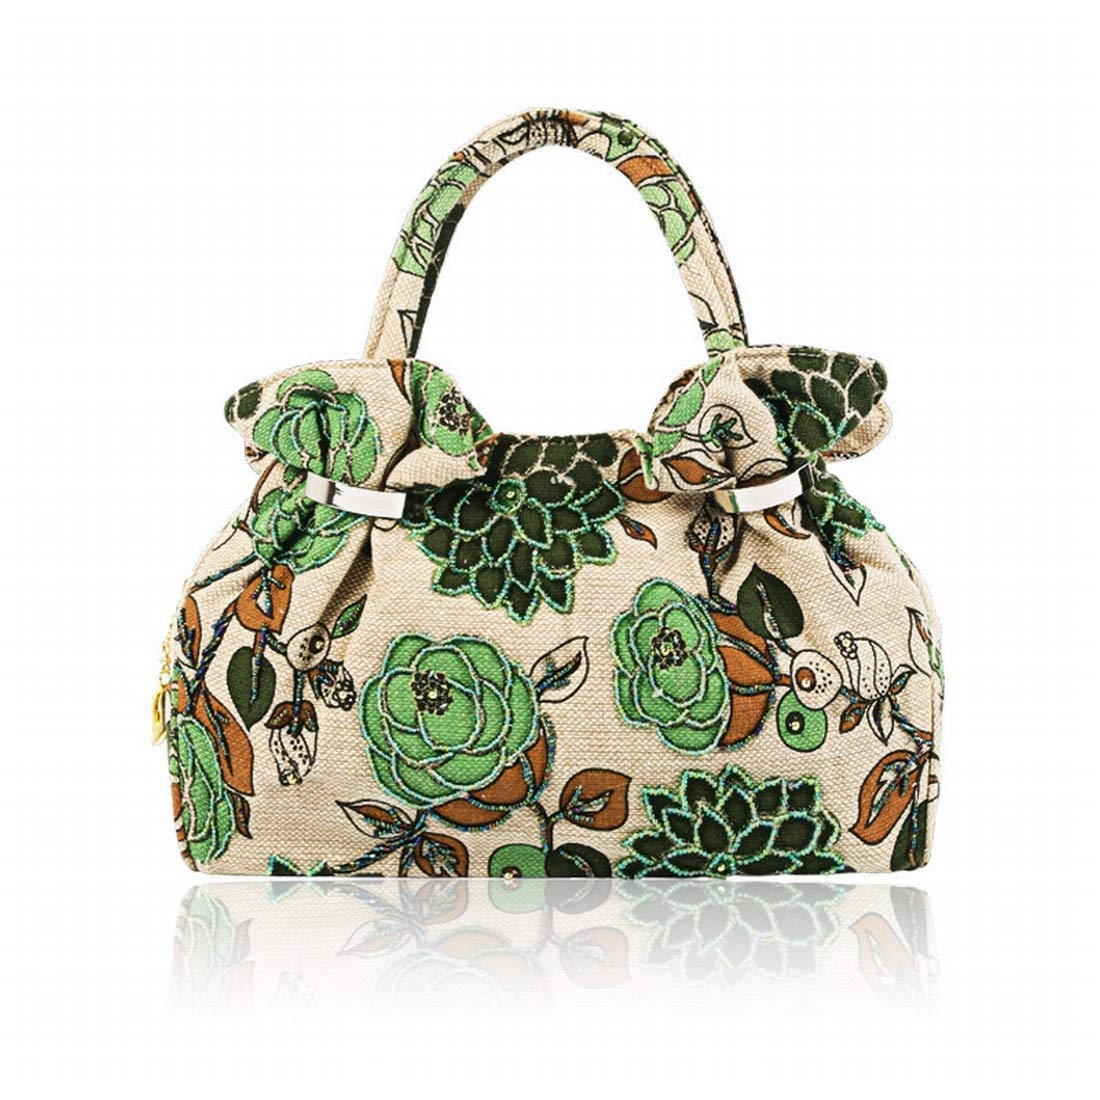 Sixminyo Damen Vintage Besteickte Perlen Perlen Perlen Pailletten Abend Clutch Hochzeitsgesellschaft Handtasche (Farbe   Grün) B07Q3R6SP8 Clutches Mangelware 5d614d